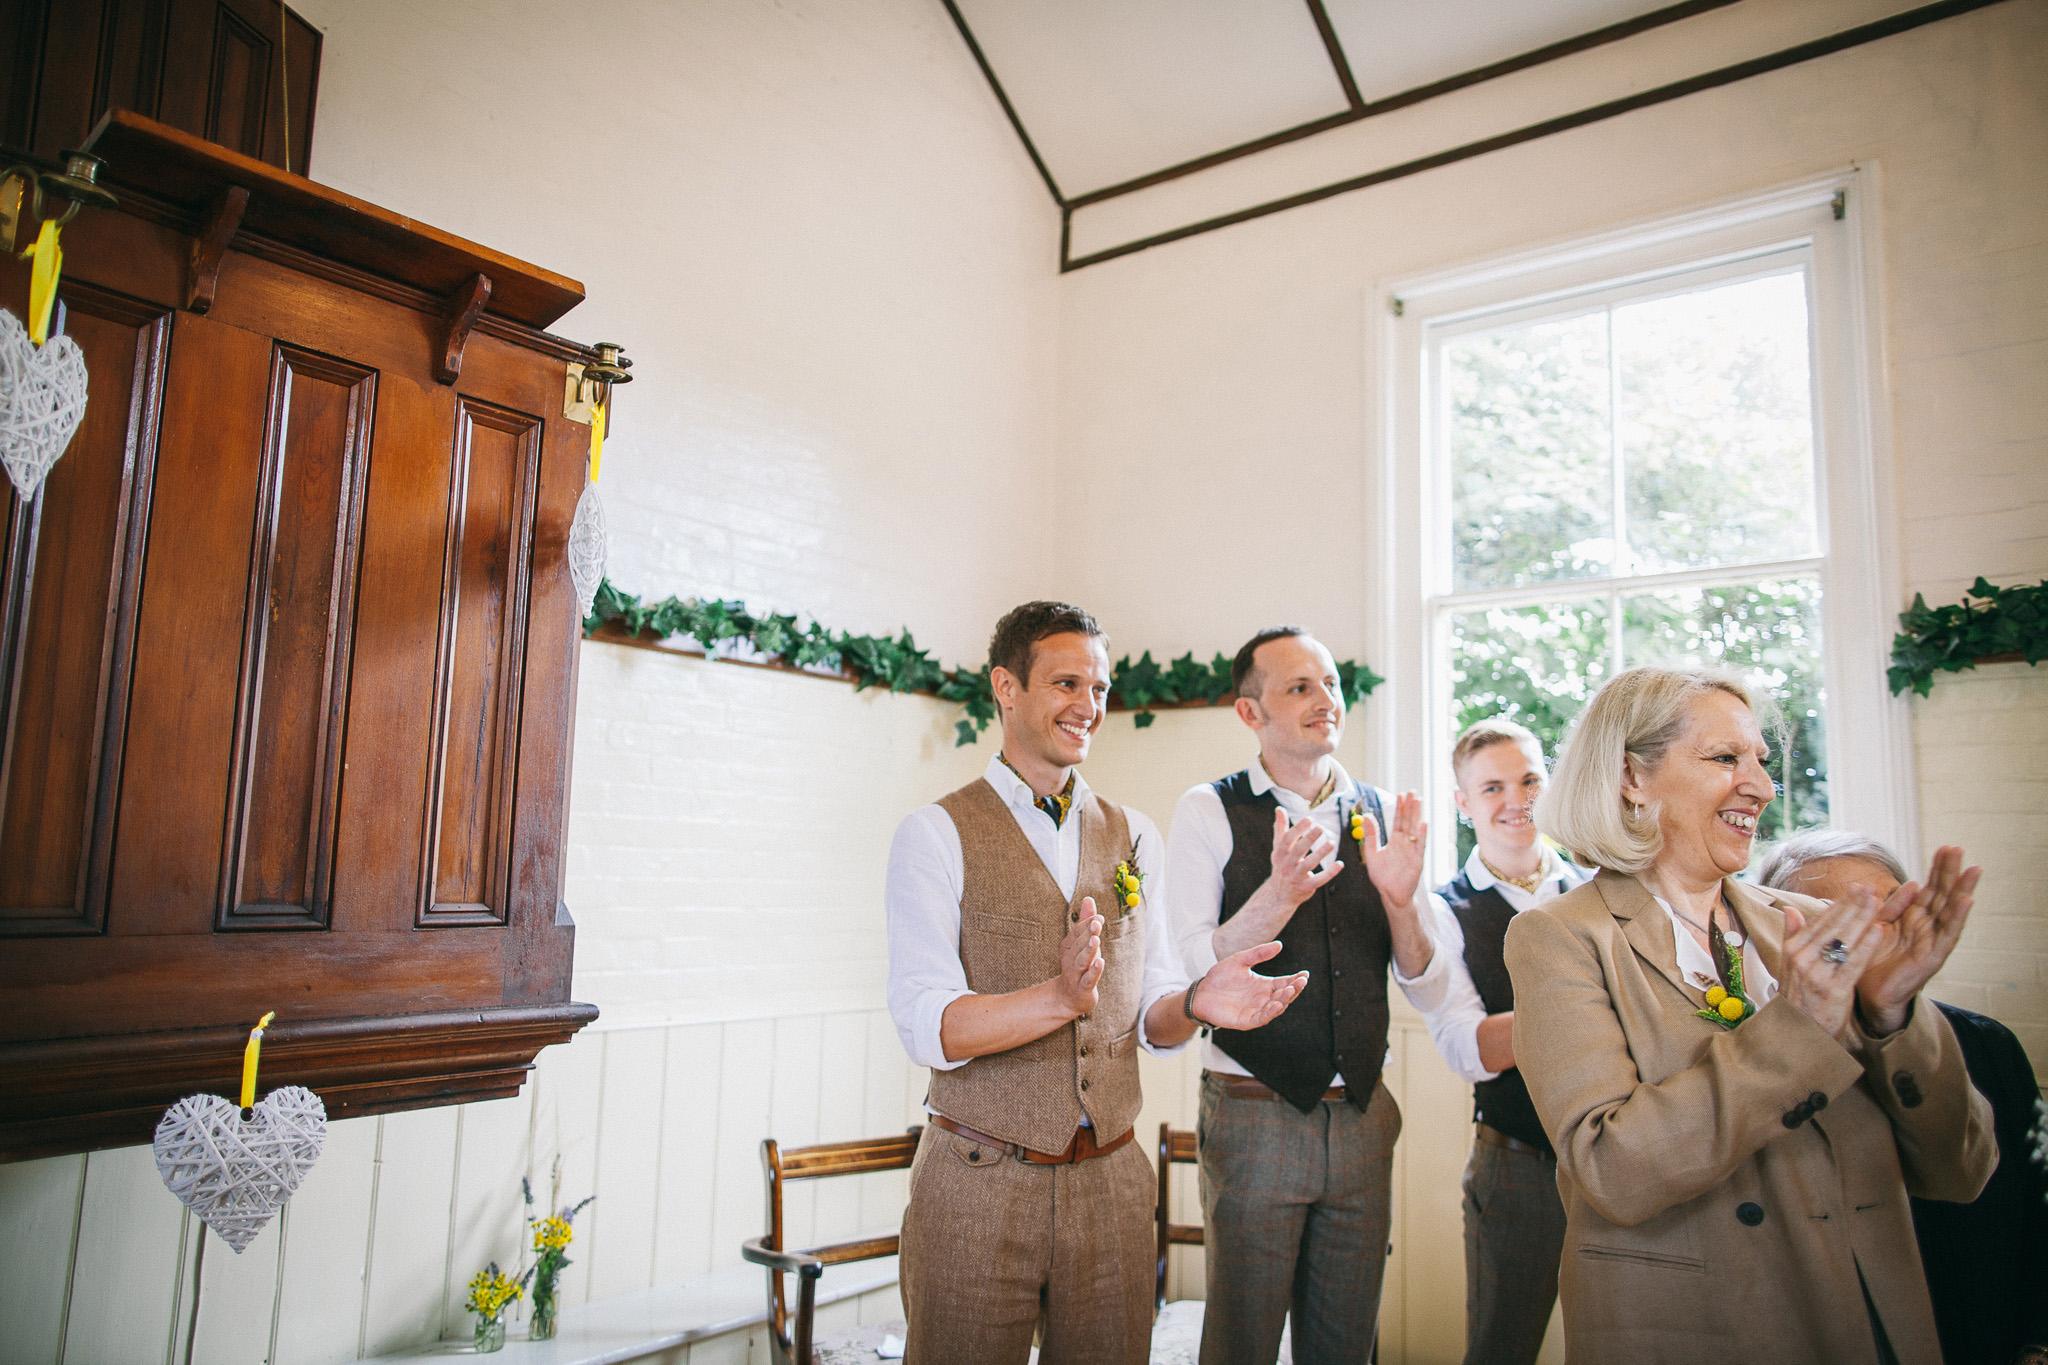 chantry_sussex_barn_wedding_306.jpg